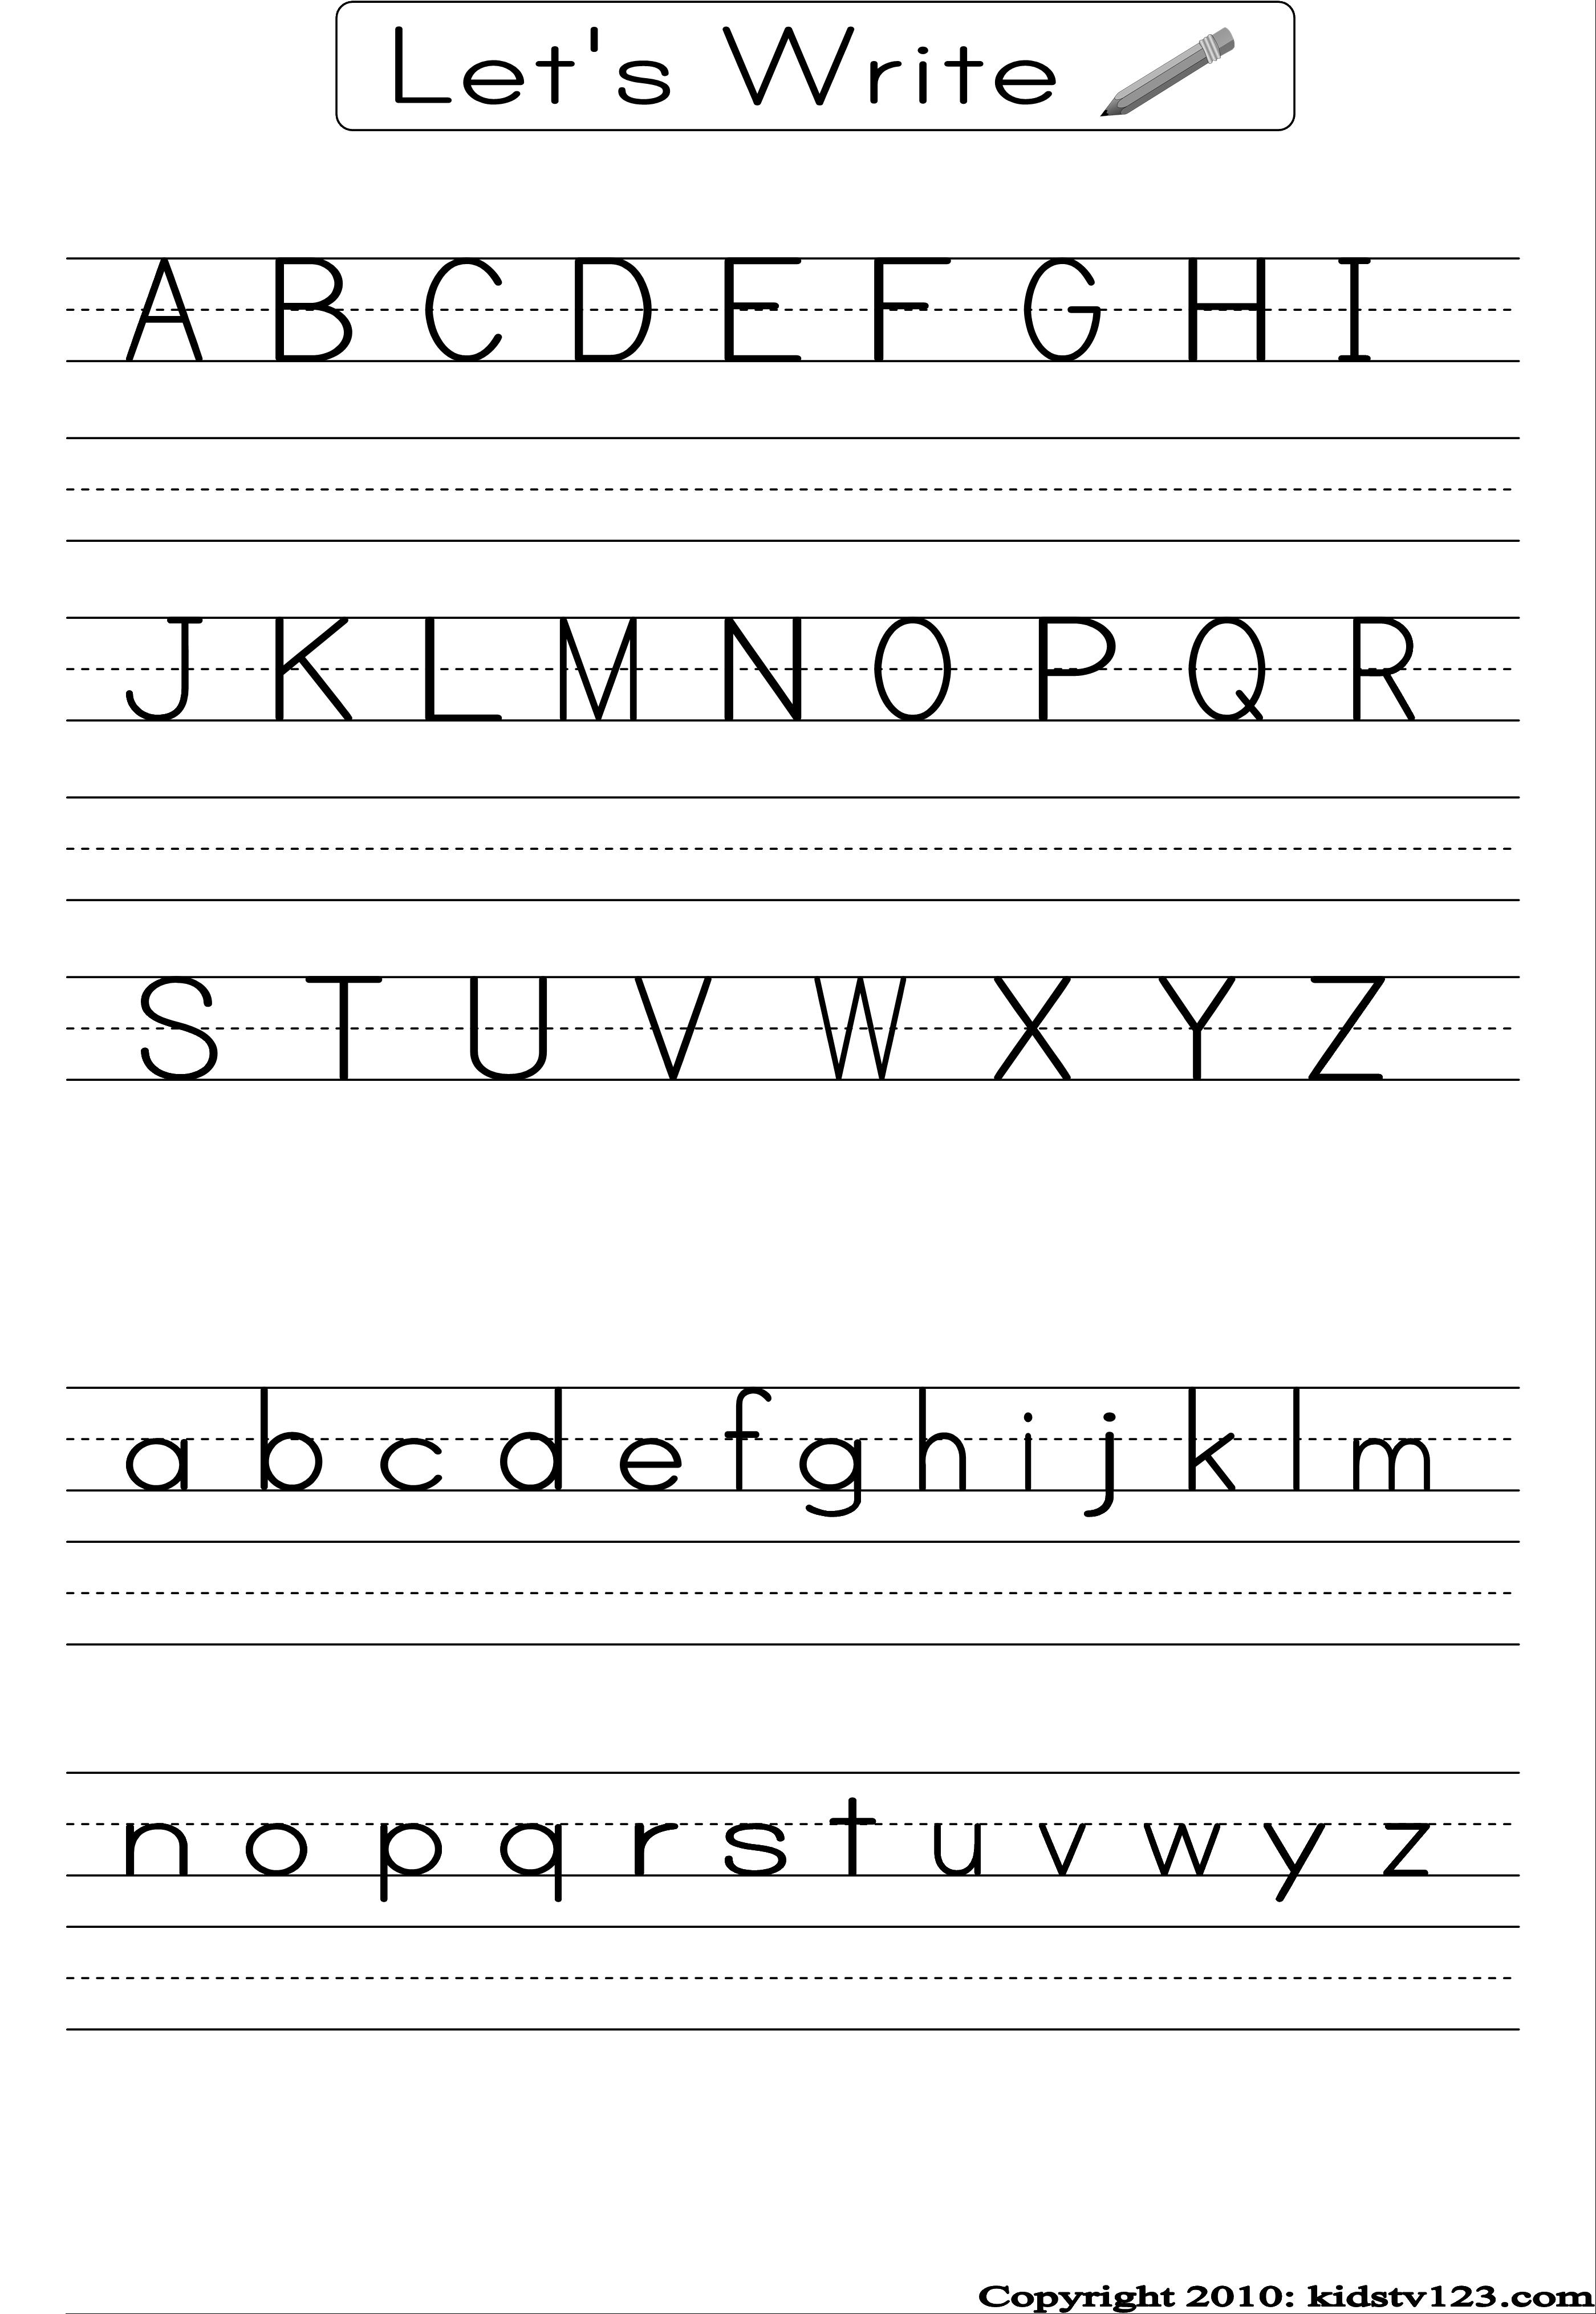 Free printable alphabet worksheets, Preschool writing and